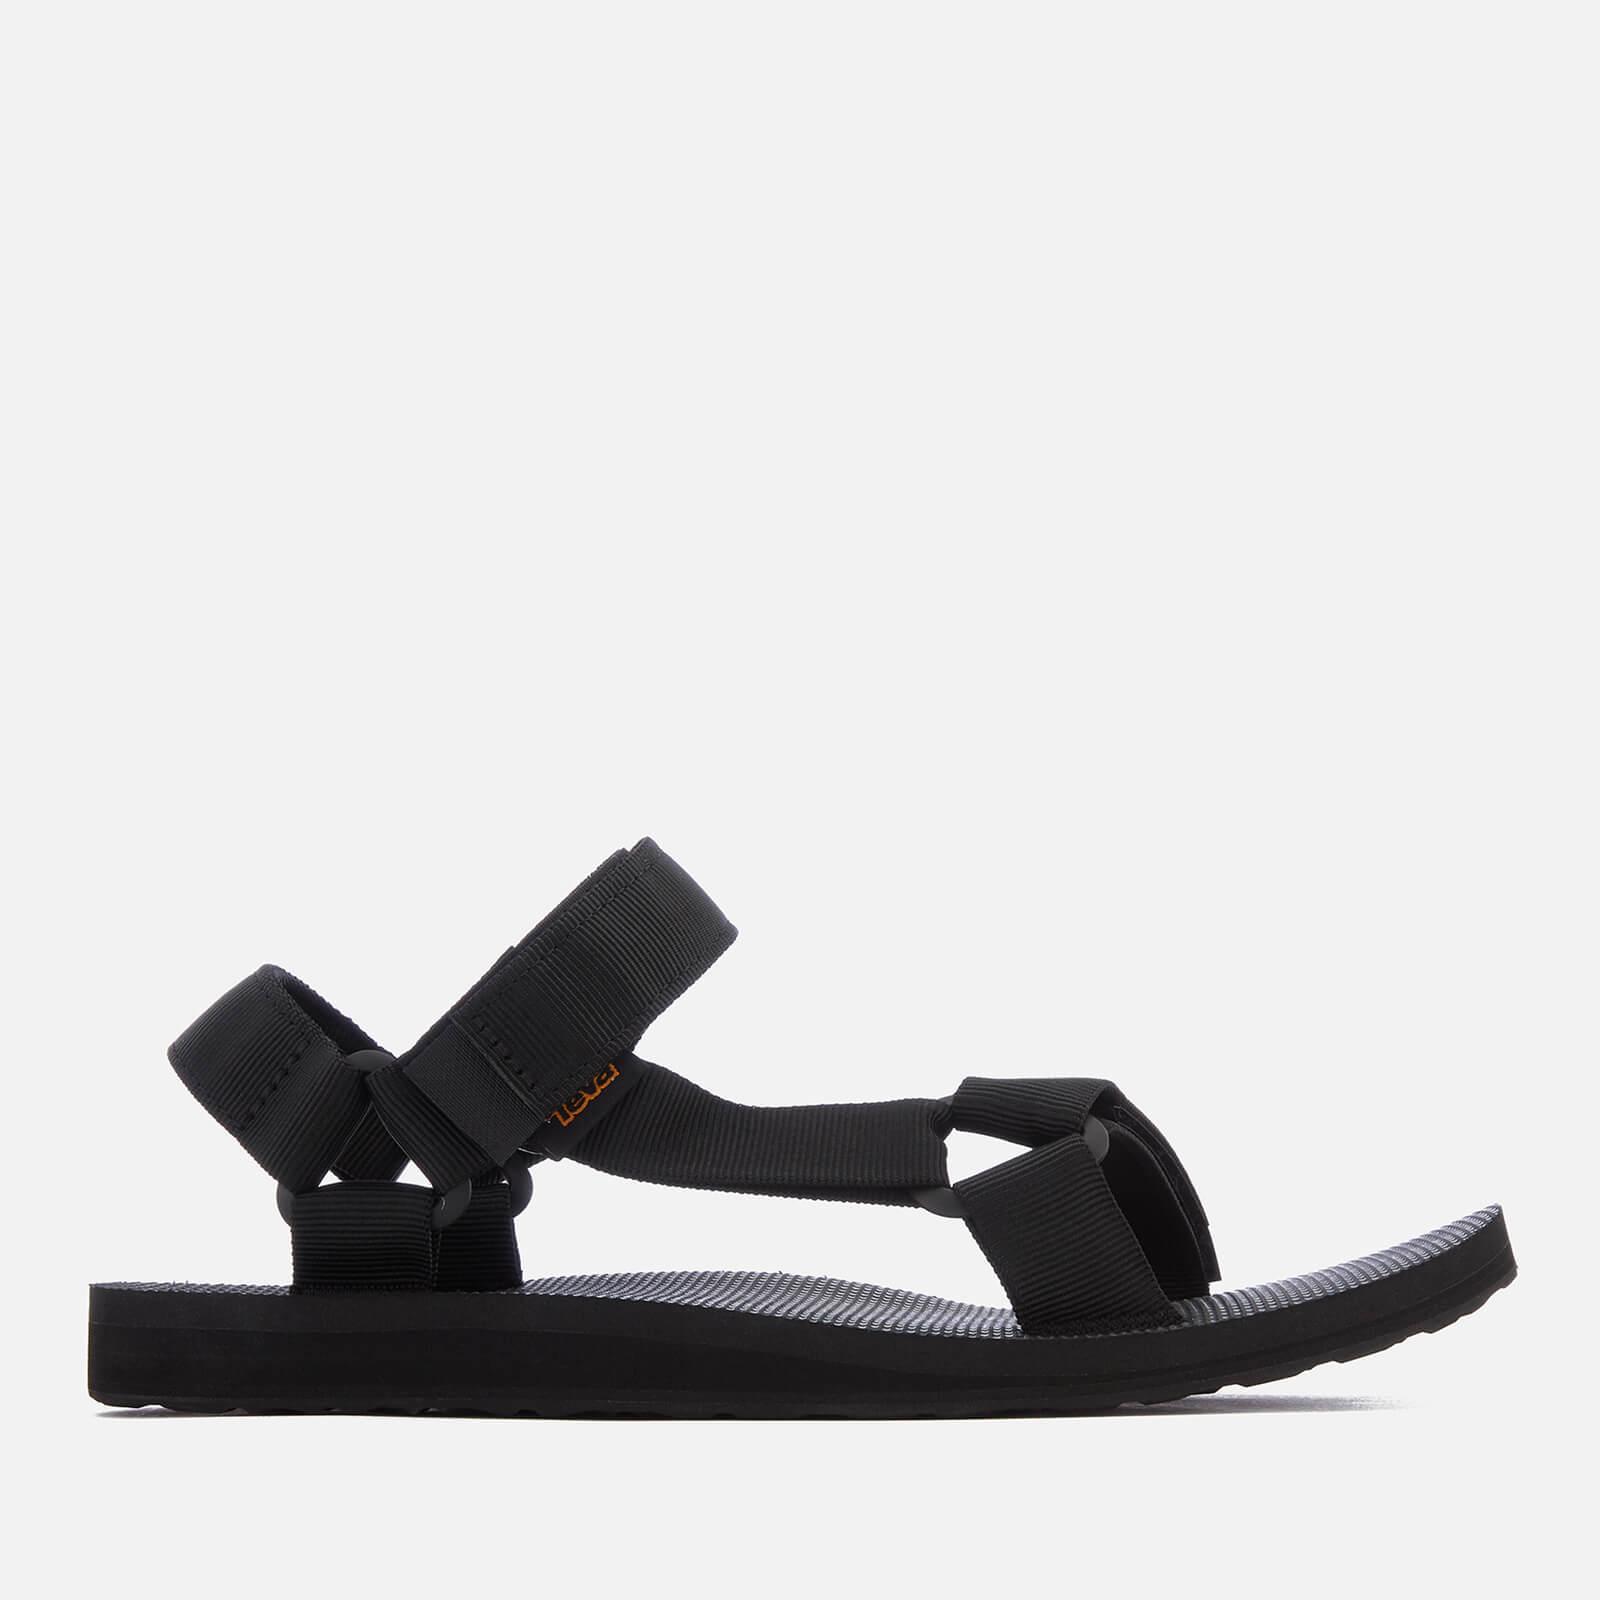 e50784eb4402 Teva Men s Original Universal Urban Sport Sandals - Black Mens Footwear